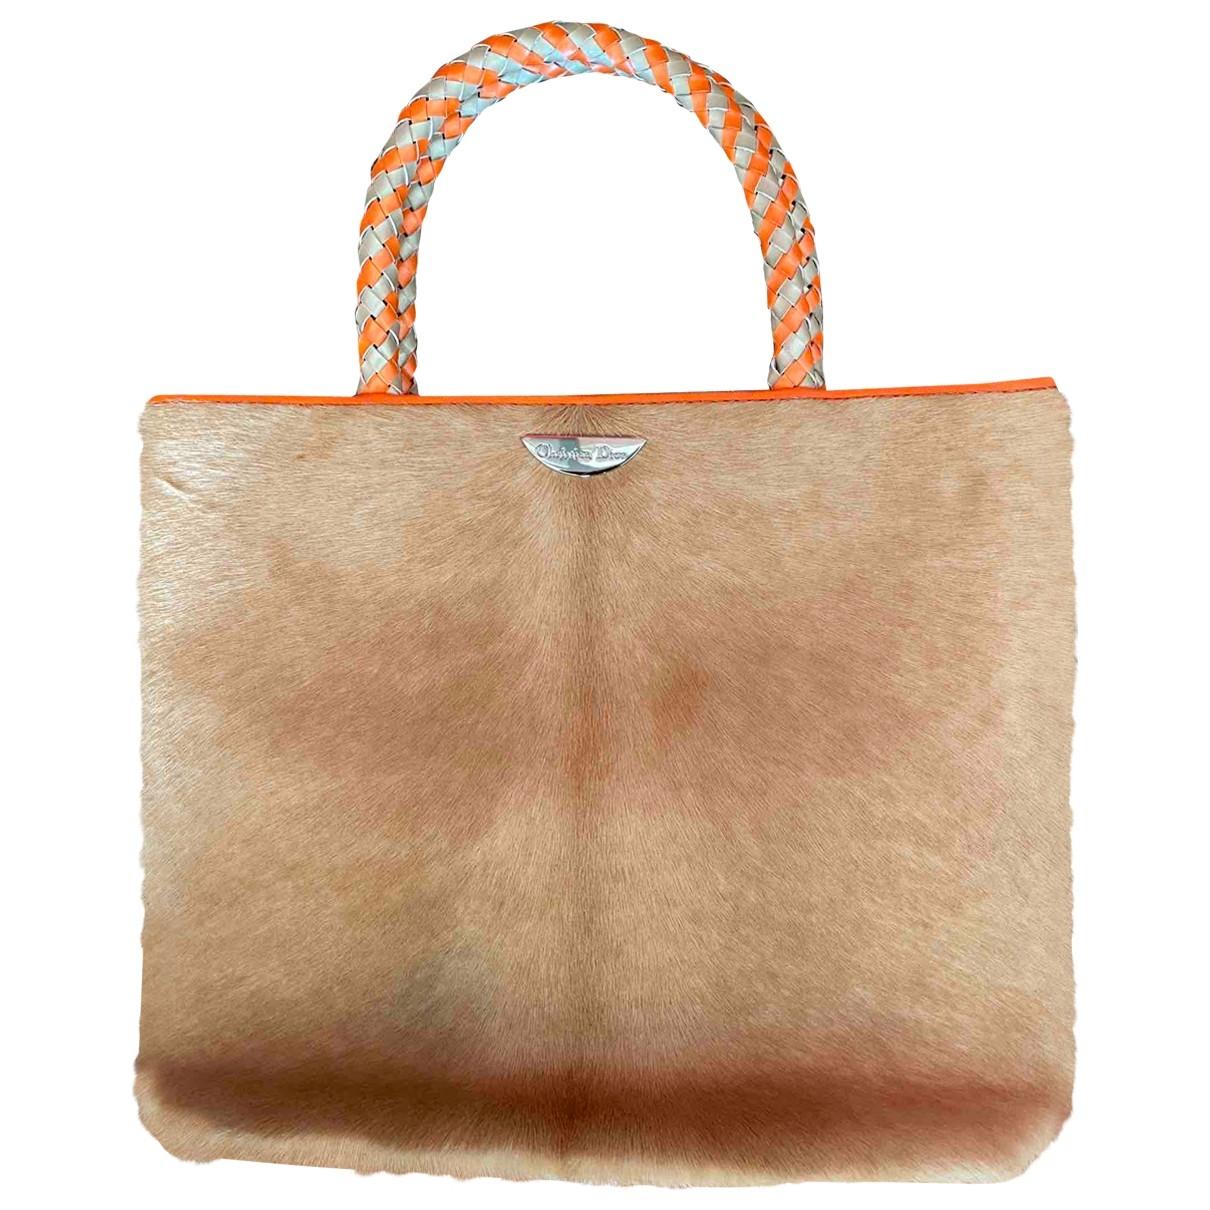 Dior \N Beige Pony-style calfskin handbag for Women \N